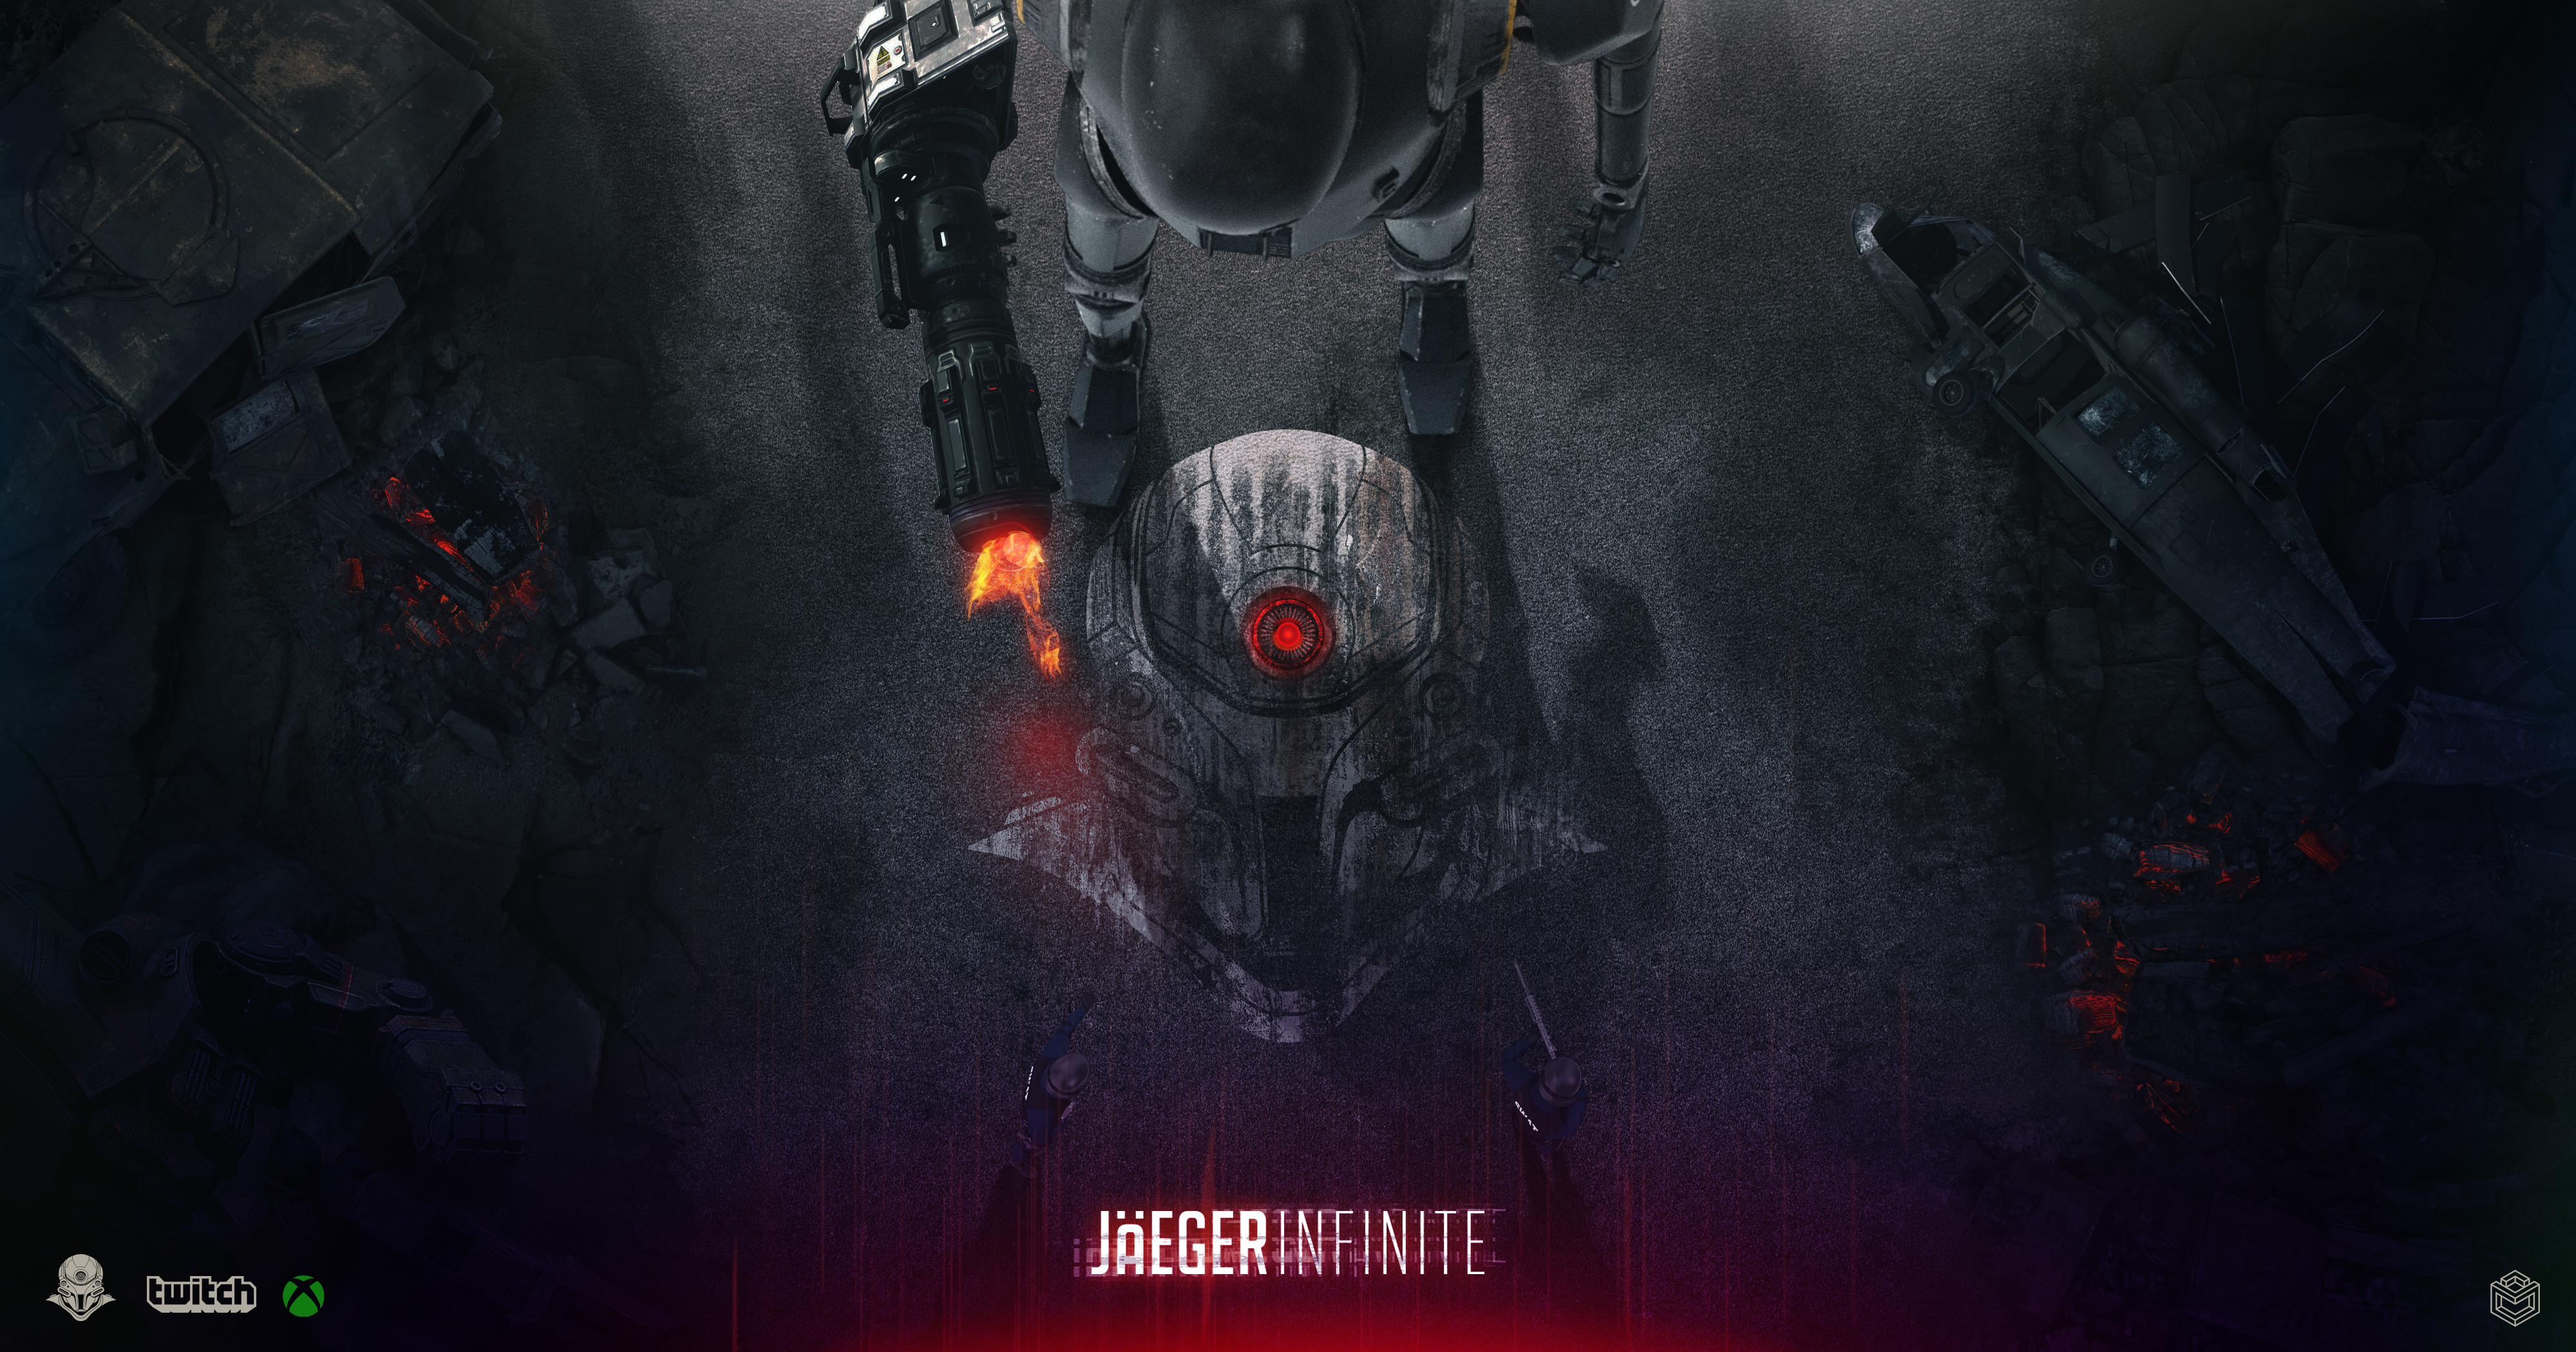 Jaeger_infinite1